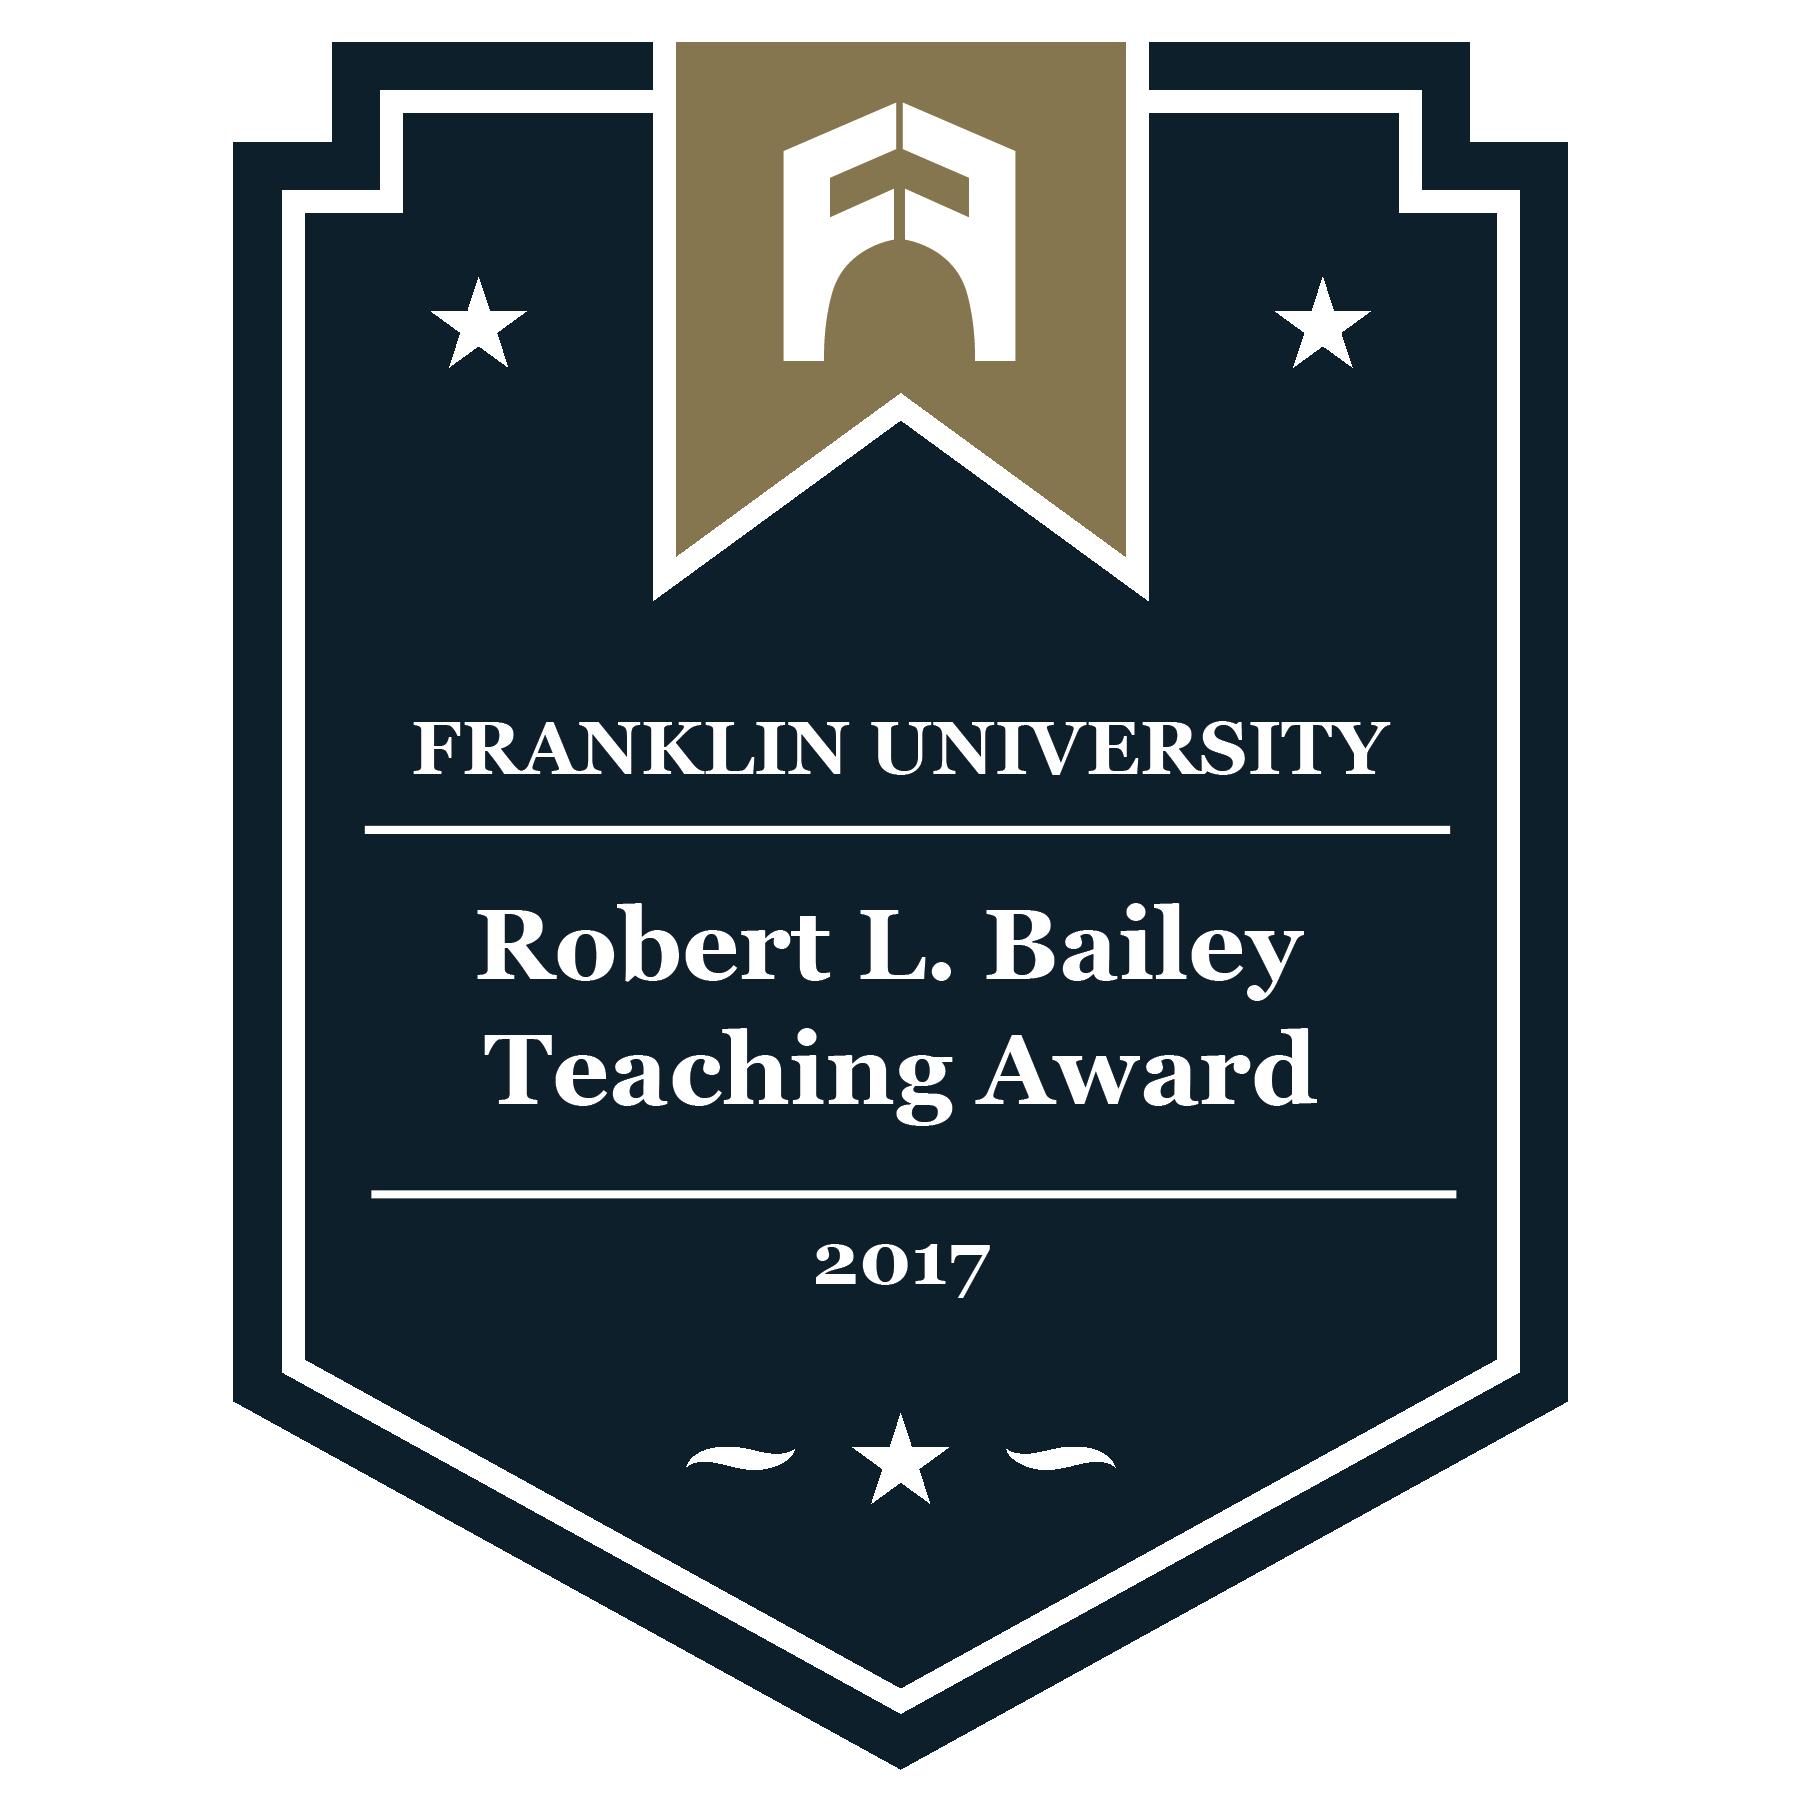 2017 Robert L. Bailey Teaching Award